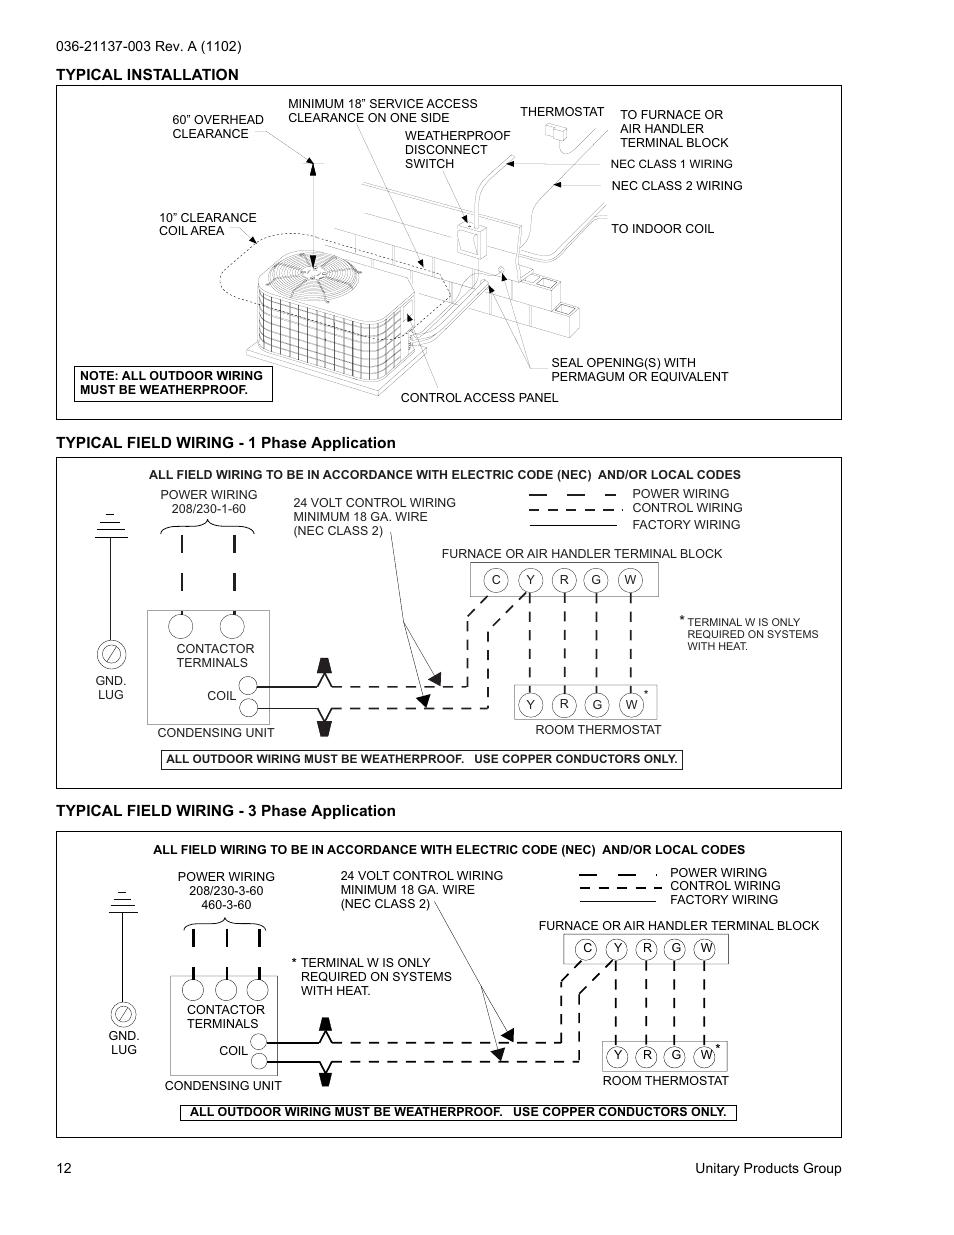 medium resolution of york h rc018 thru 060 user manual page 12 24